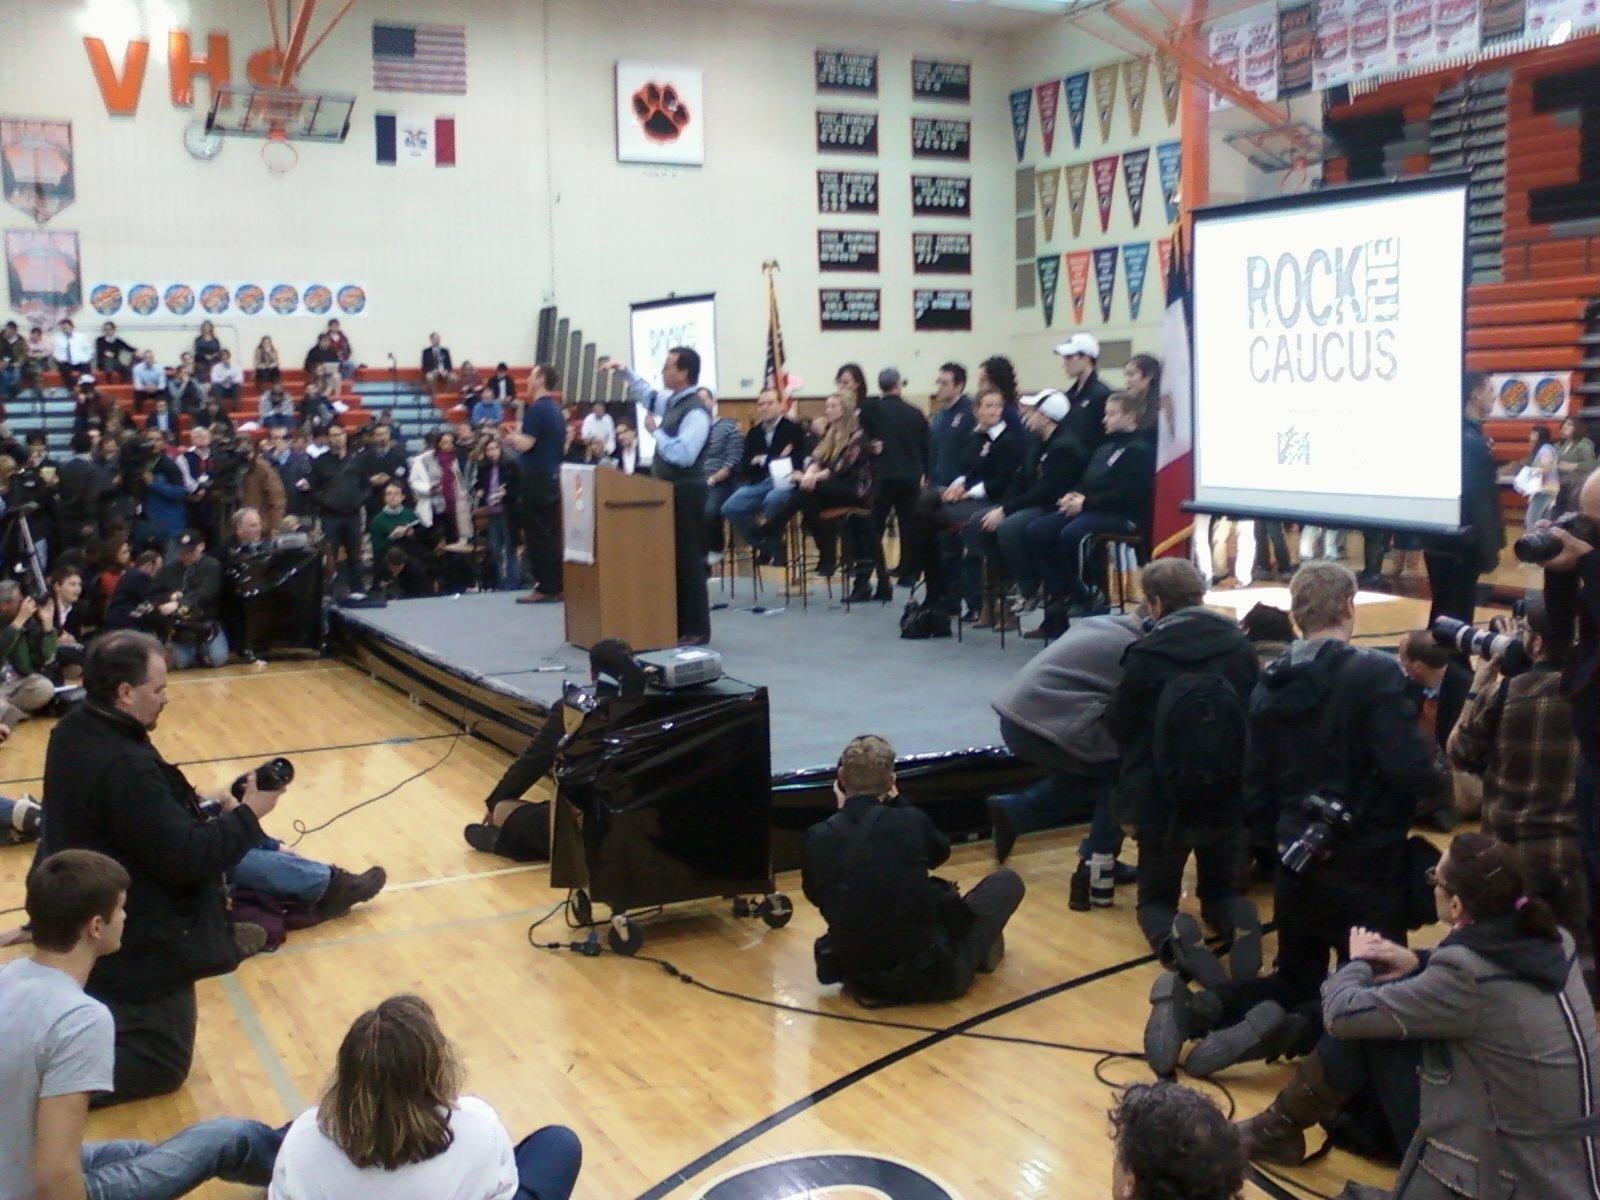 Rick Santorum at the Rock the Caucus event